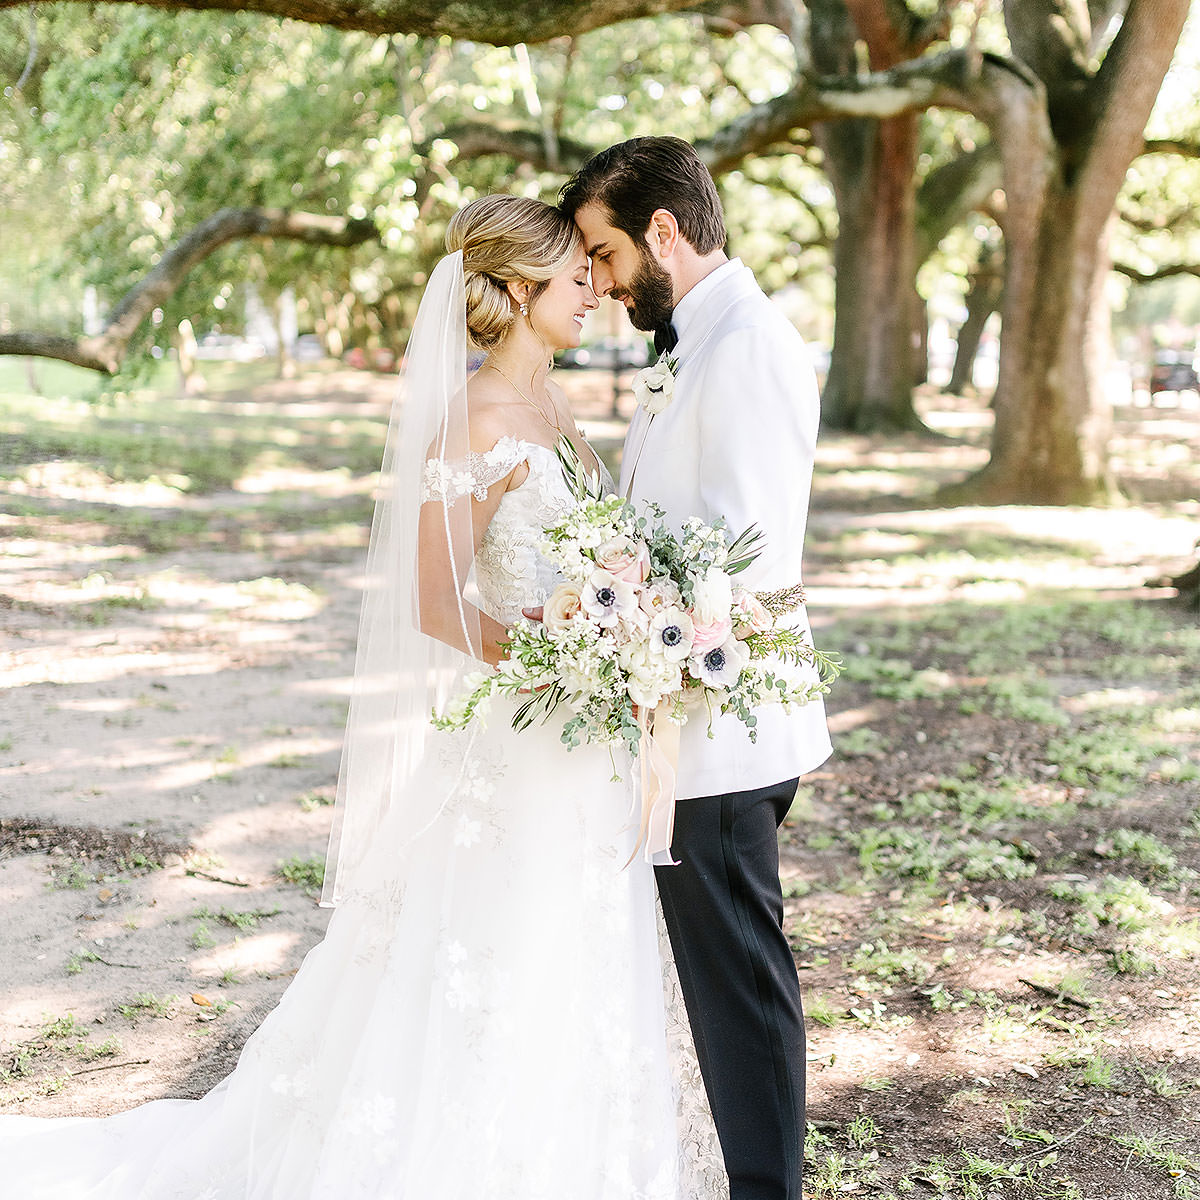 St. Charles Elms Mansion Wedding Photographer | Lindsay & Jonathan